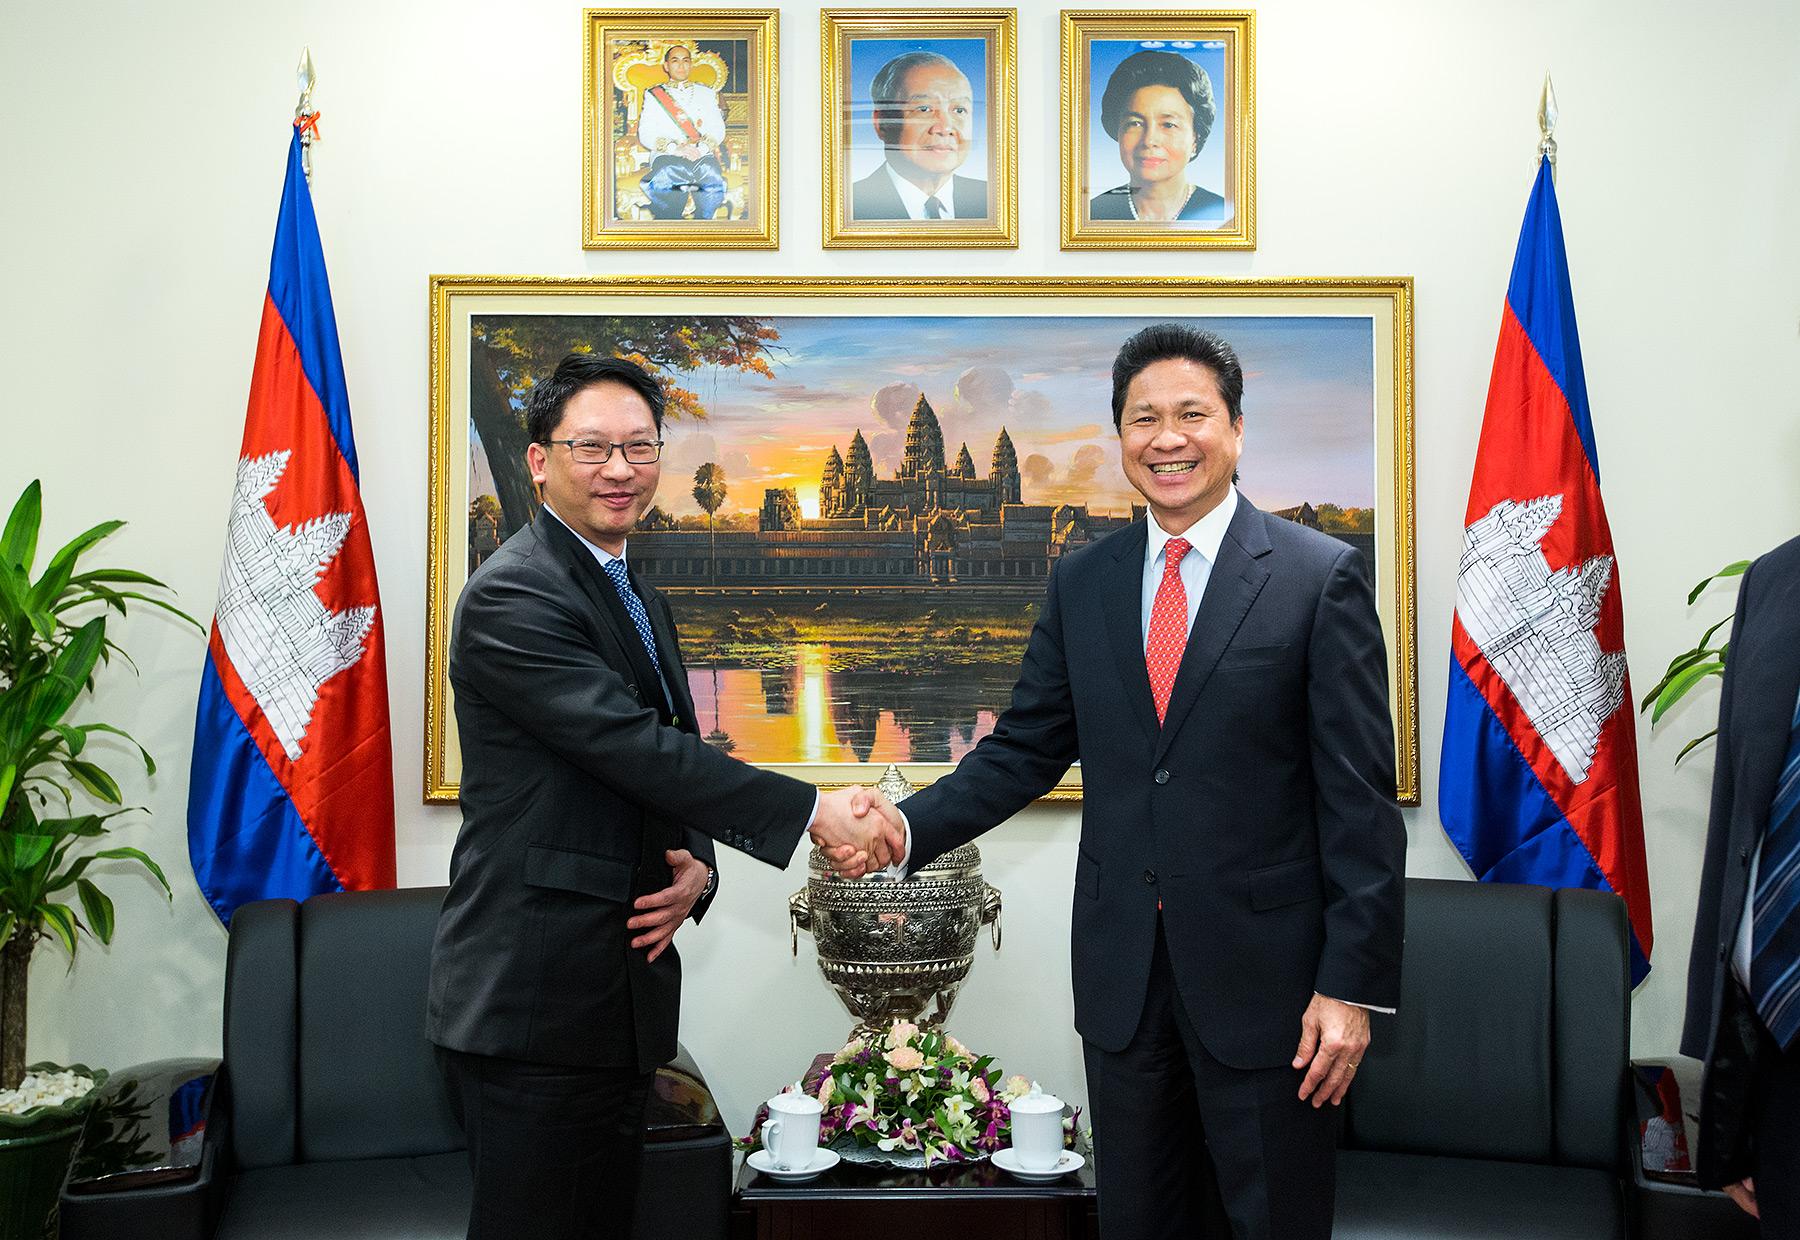 Sun Chanthol, Cambodia Minister of Commerce, Finance Mininister Hong Kong, Phnom Penh